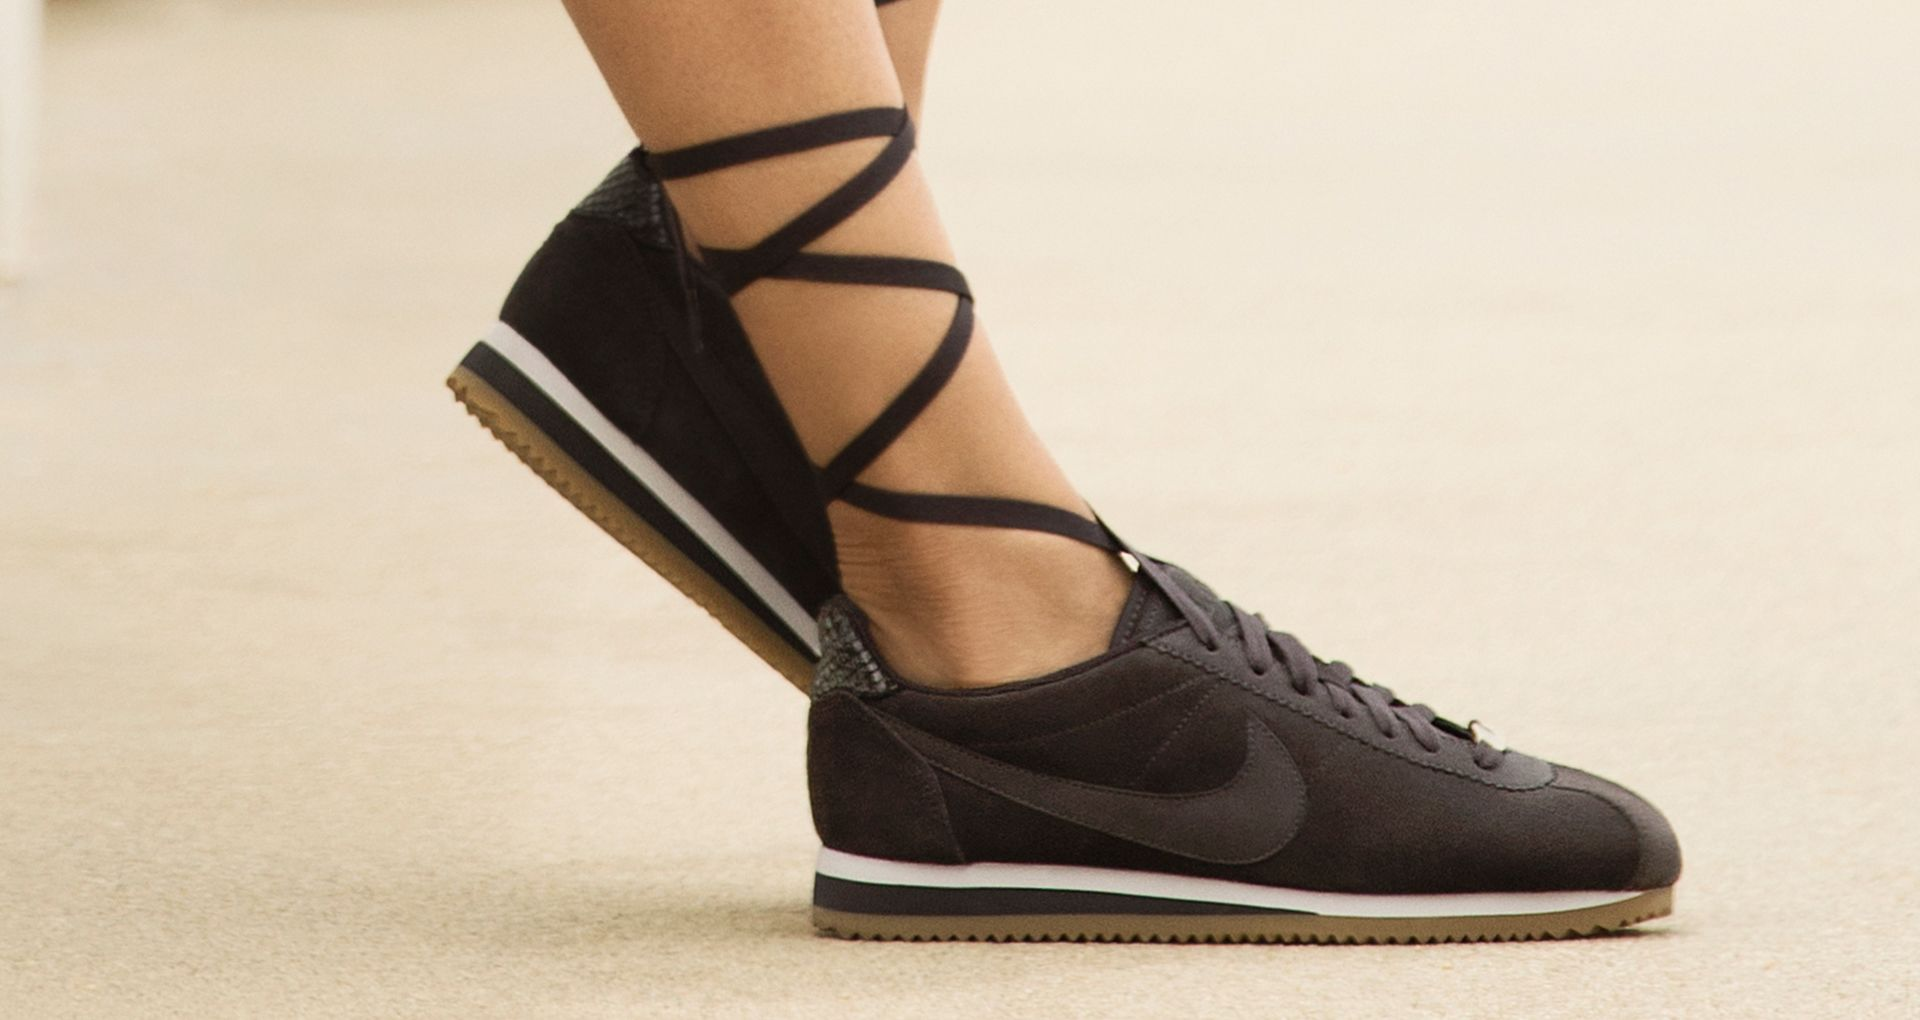 reputable site 522de f0215 Women's Nike Classic Cortez A.L.C. 'Oil Grey' Release Date ...